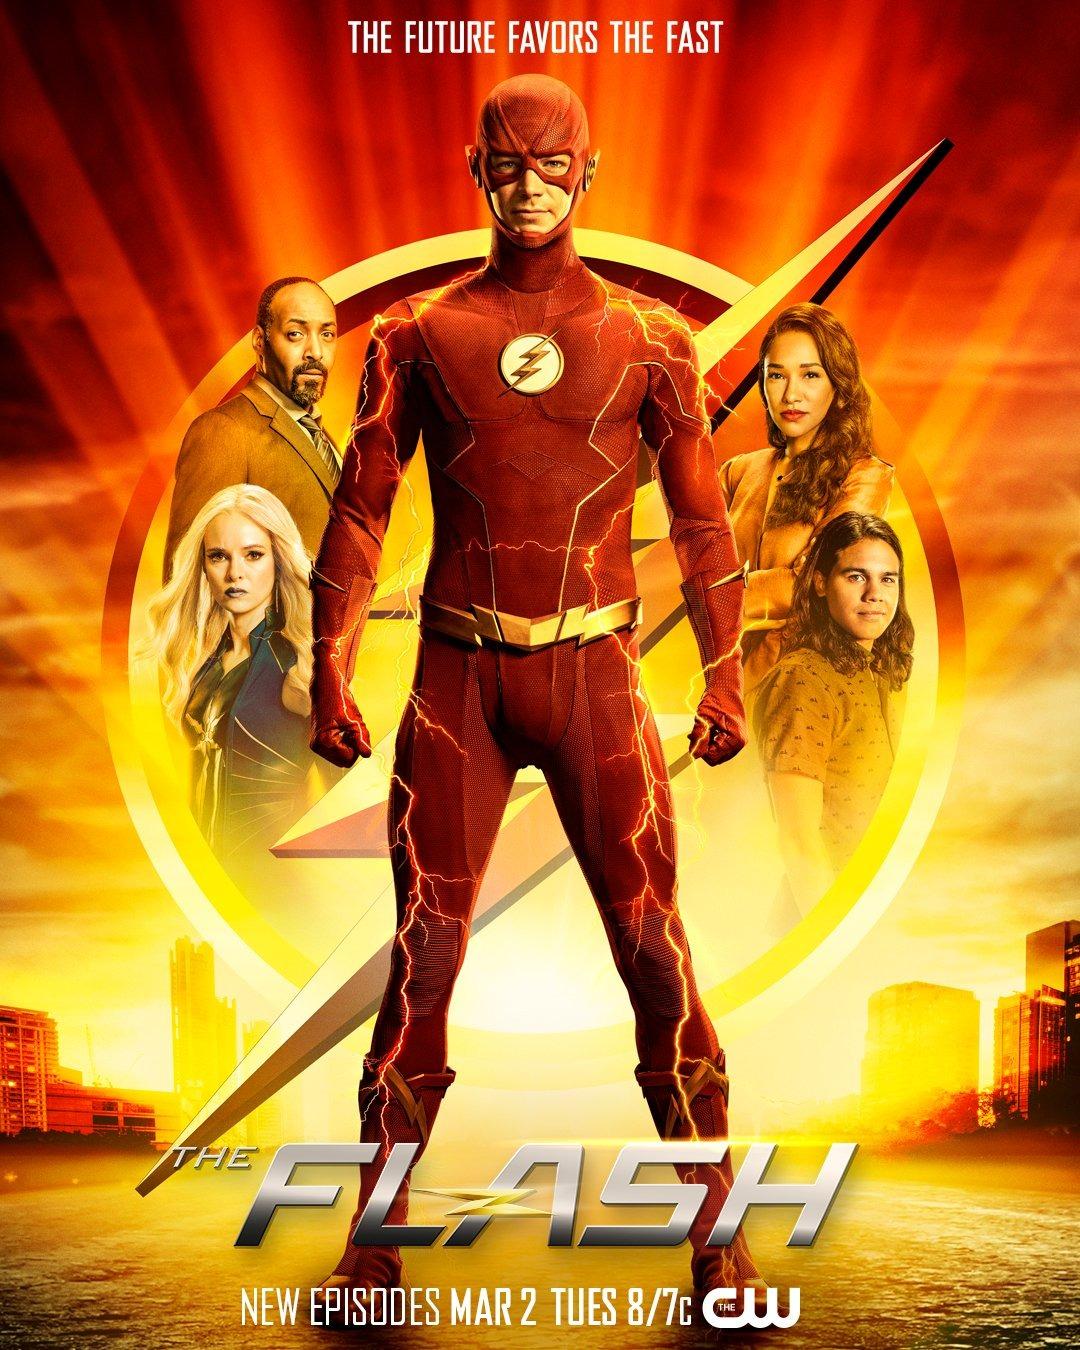 The Flash Tv Series 2014 Imdb